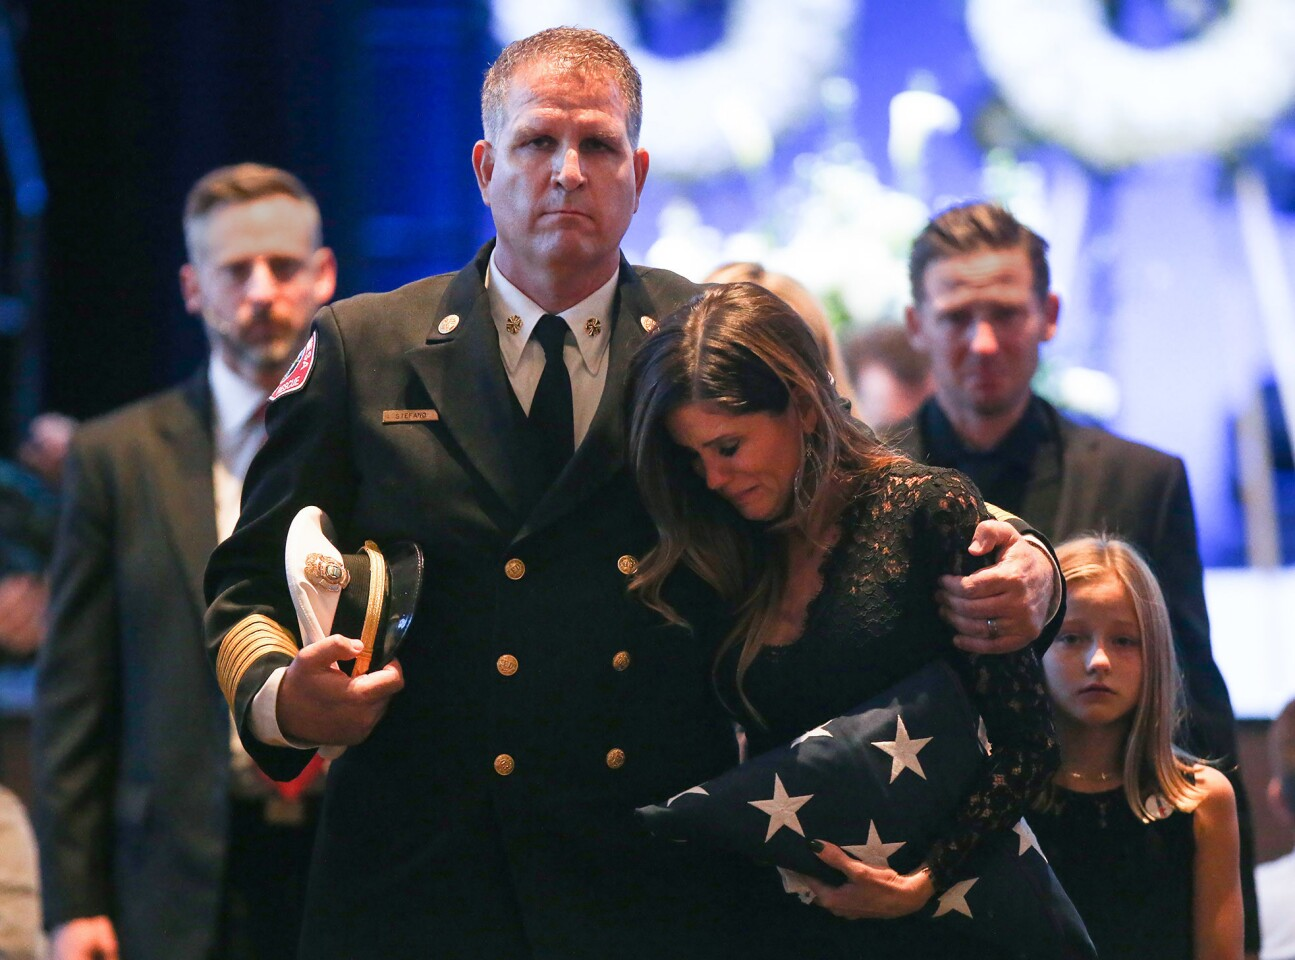 Capt. Michael Kreza memorial service